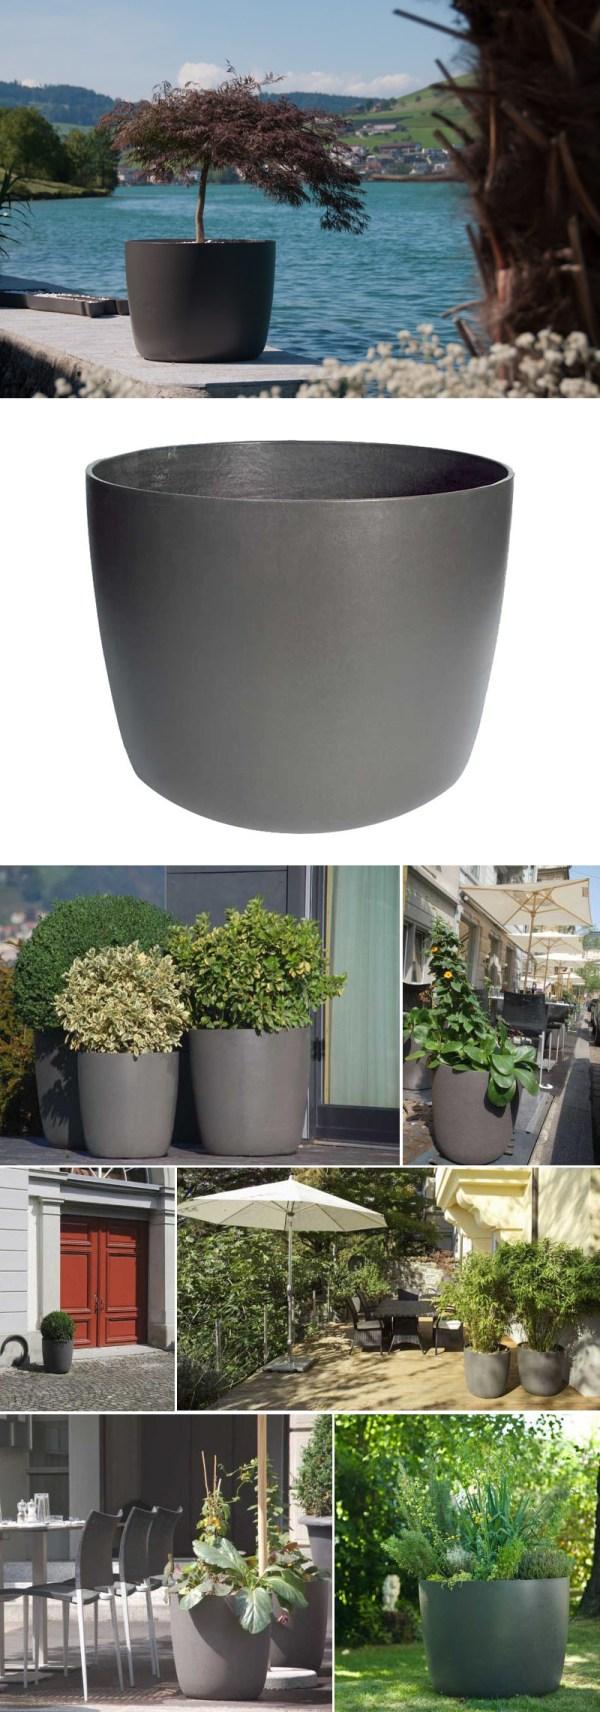 Martin Mostboeck Kyoto Large Modern Planter Pot